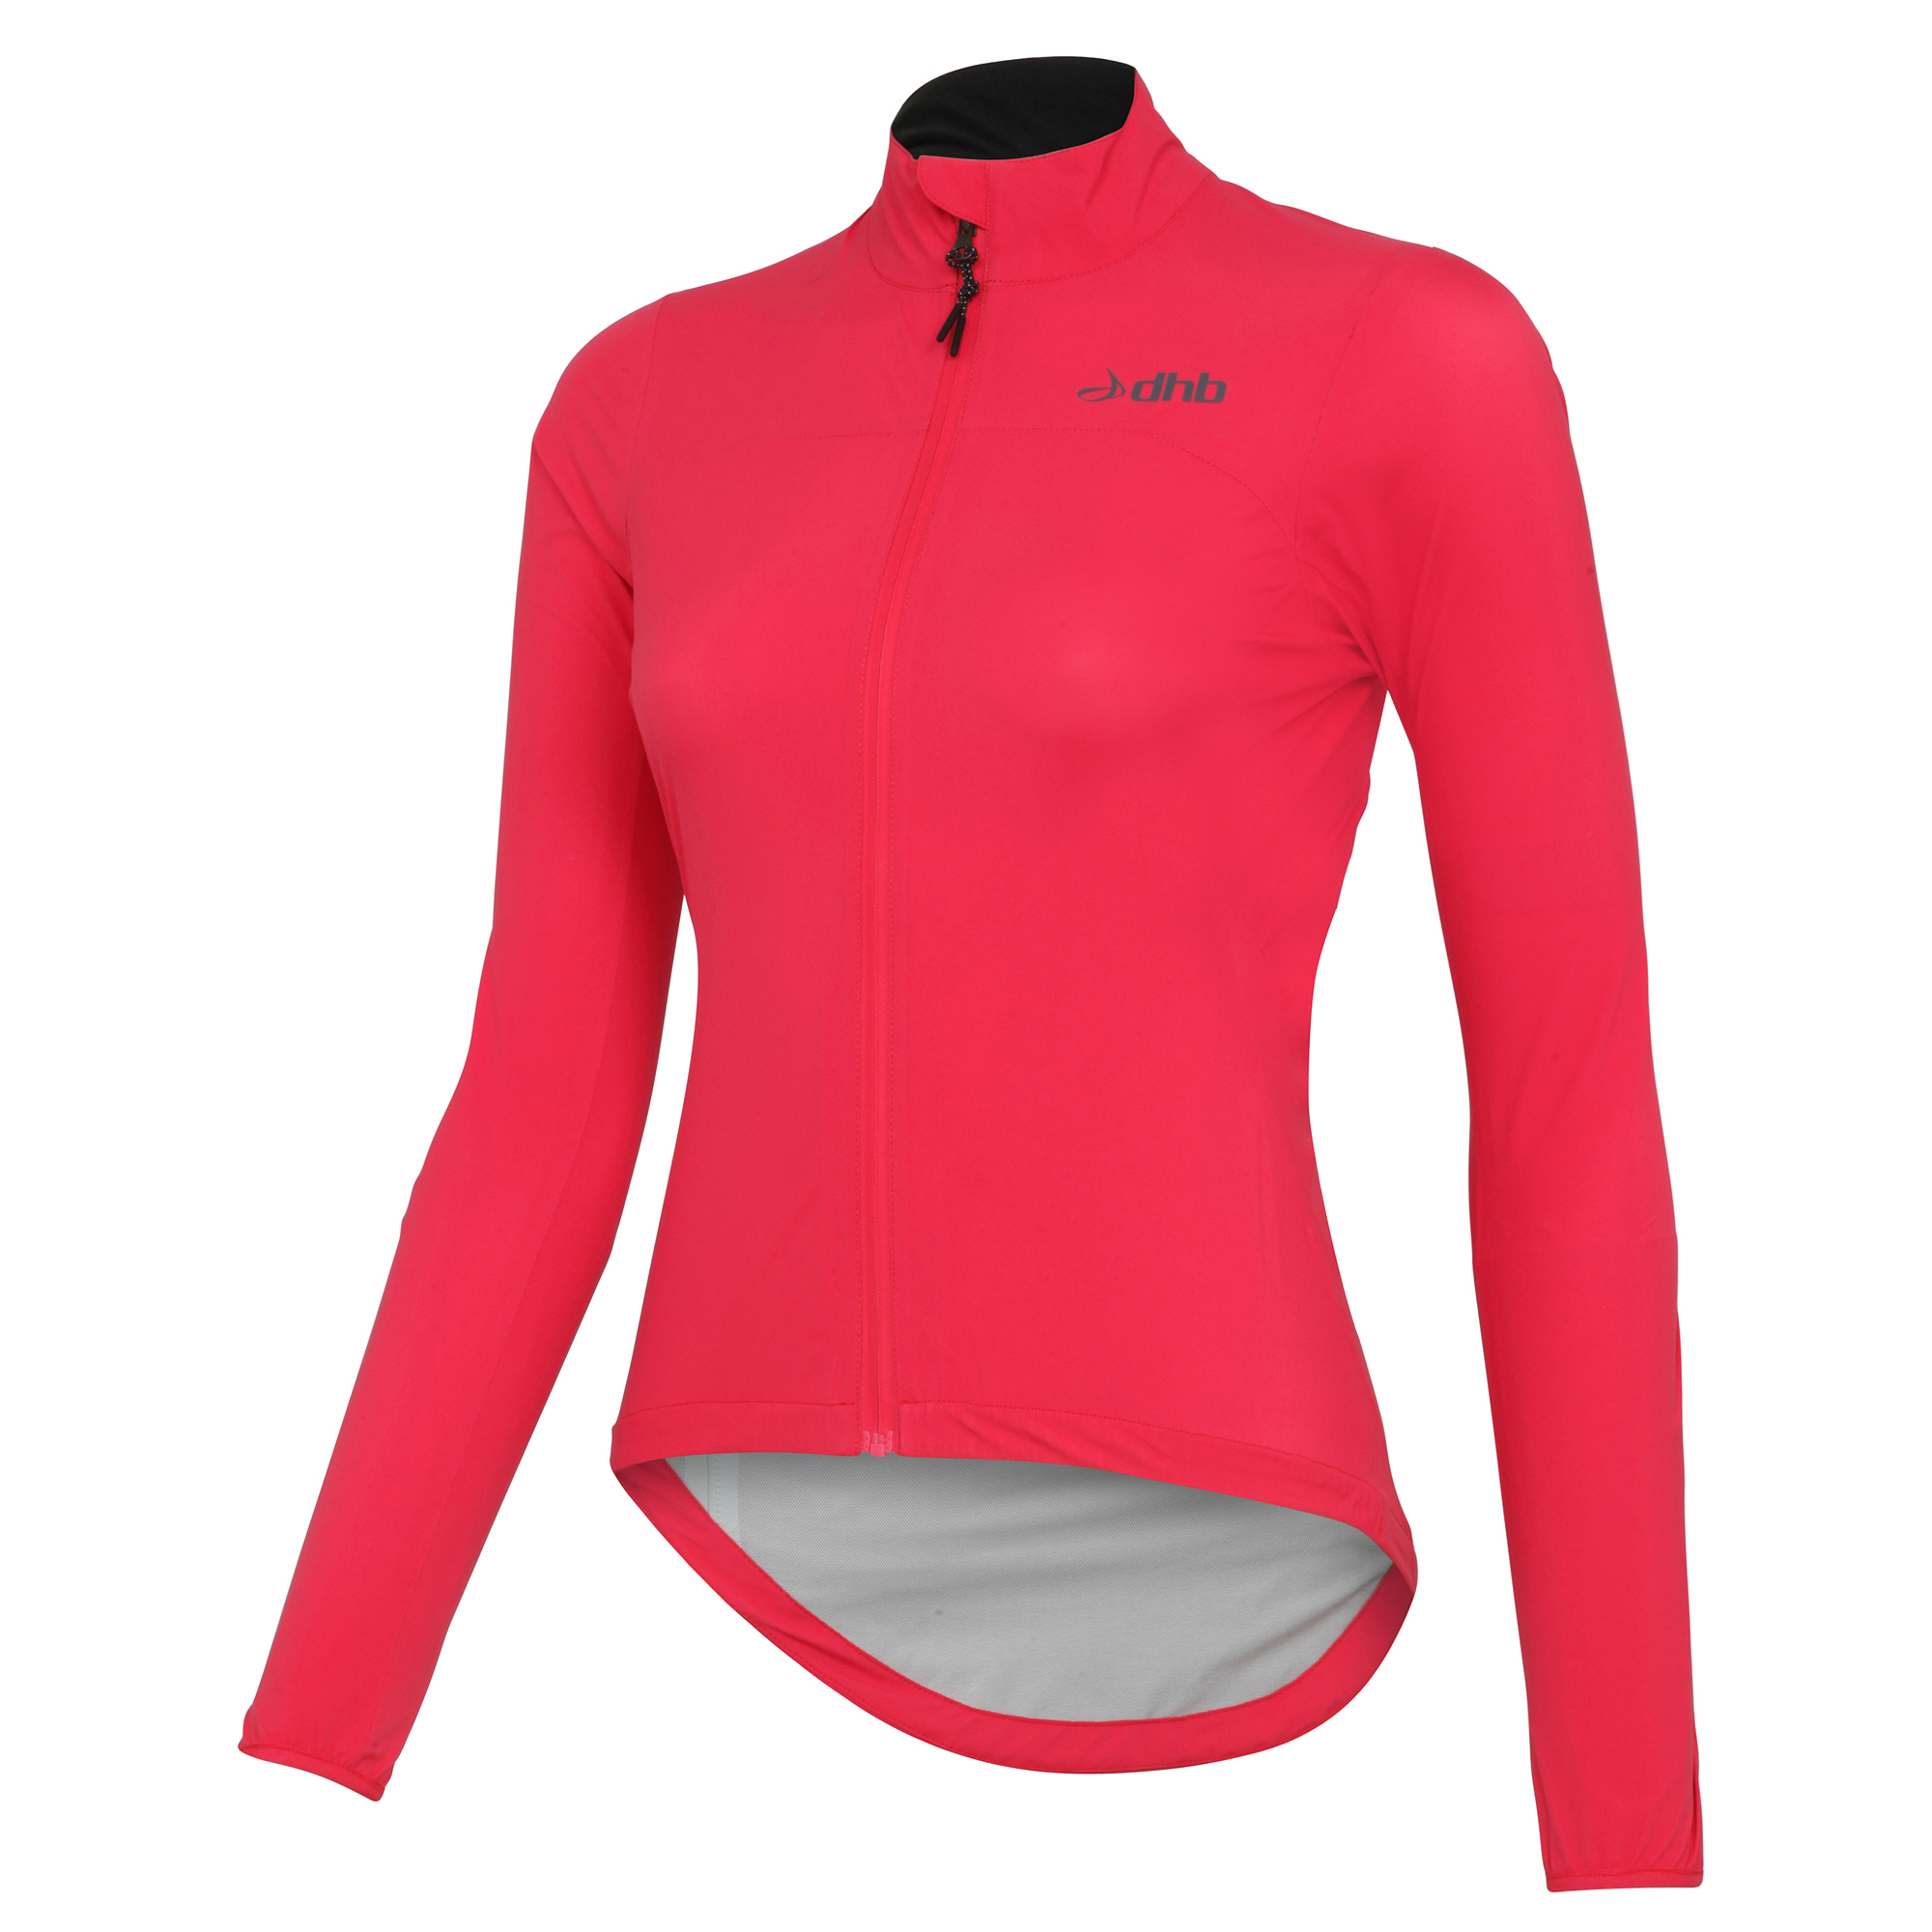 dhb Aeron Women's Tempo Waterproof Jacket, £80